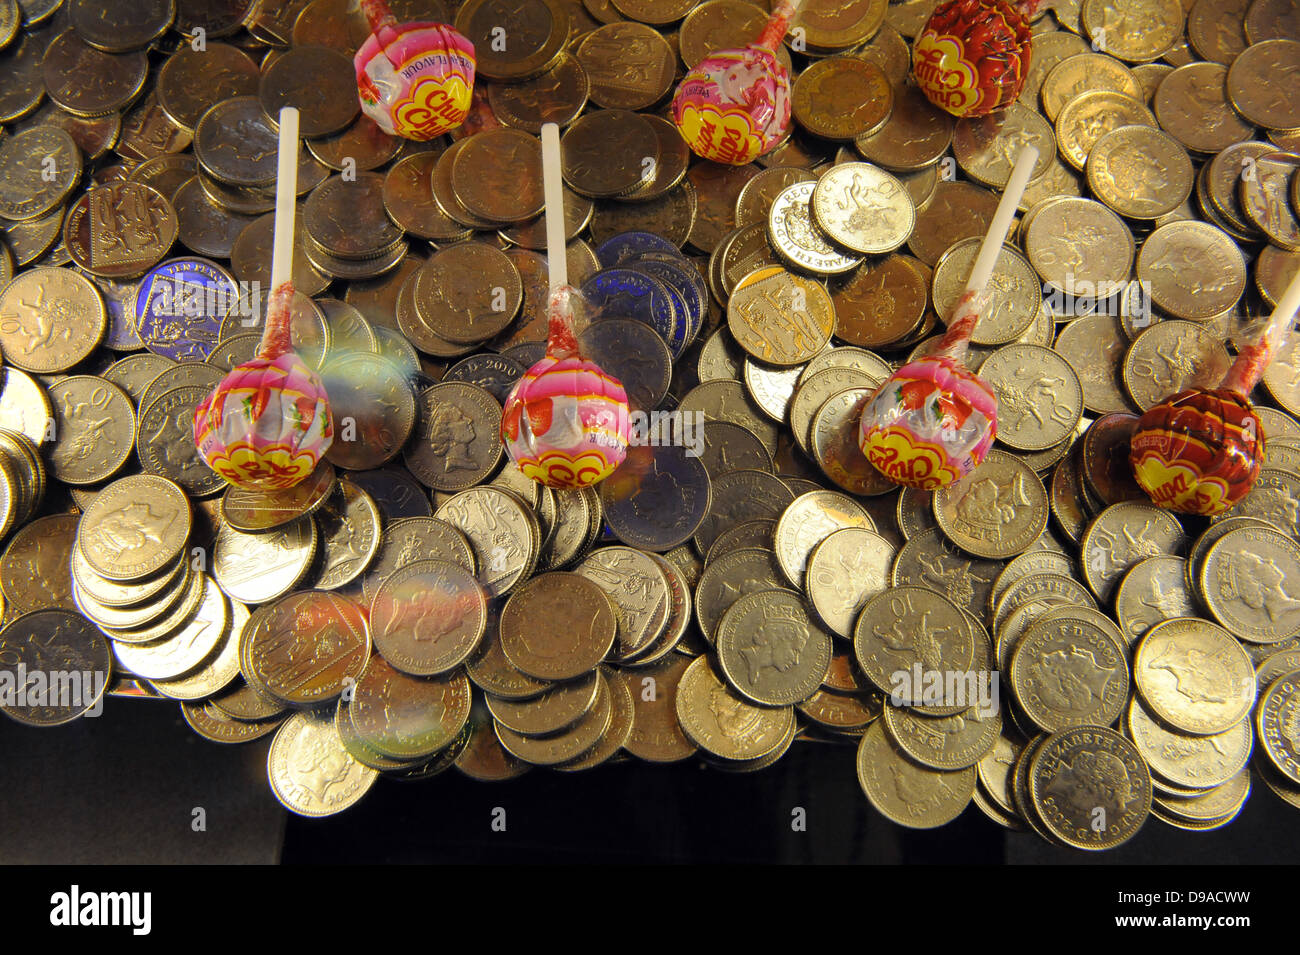 A pusher type gambling machine in the Namco arcade in london, South Bank. uk - Stock Image